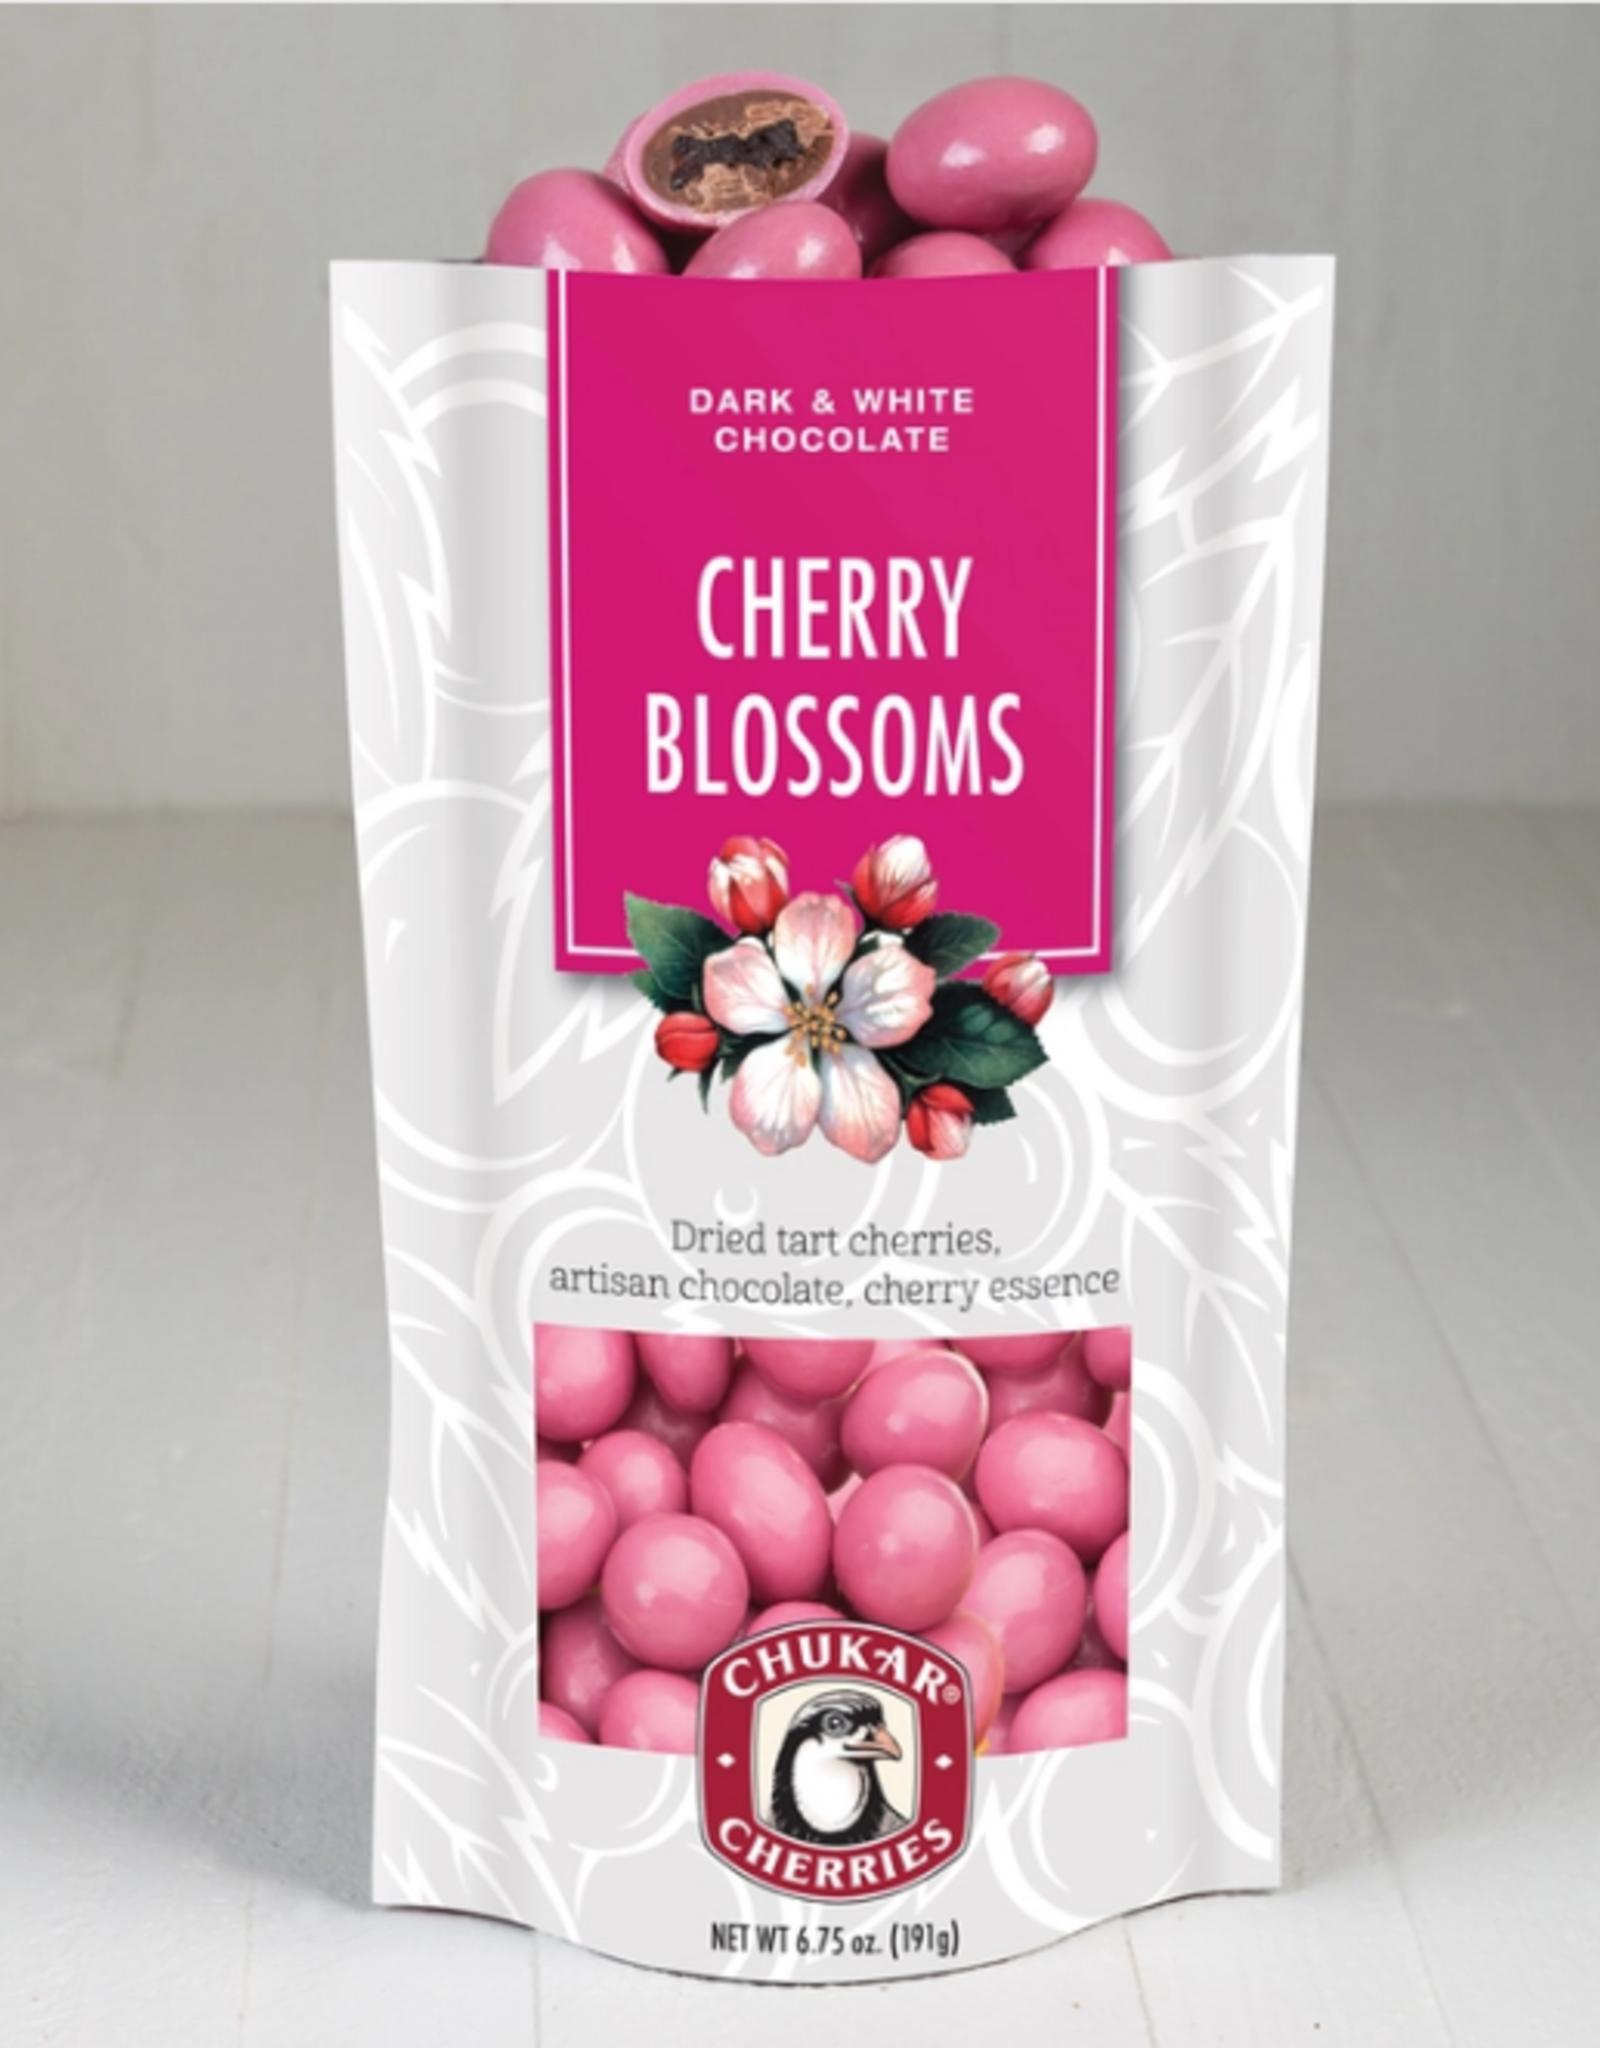 Chukar Cherry Company Cherry Blossom Bag Dk & Wht Choc